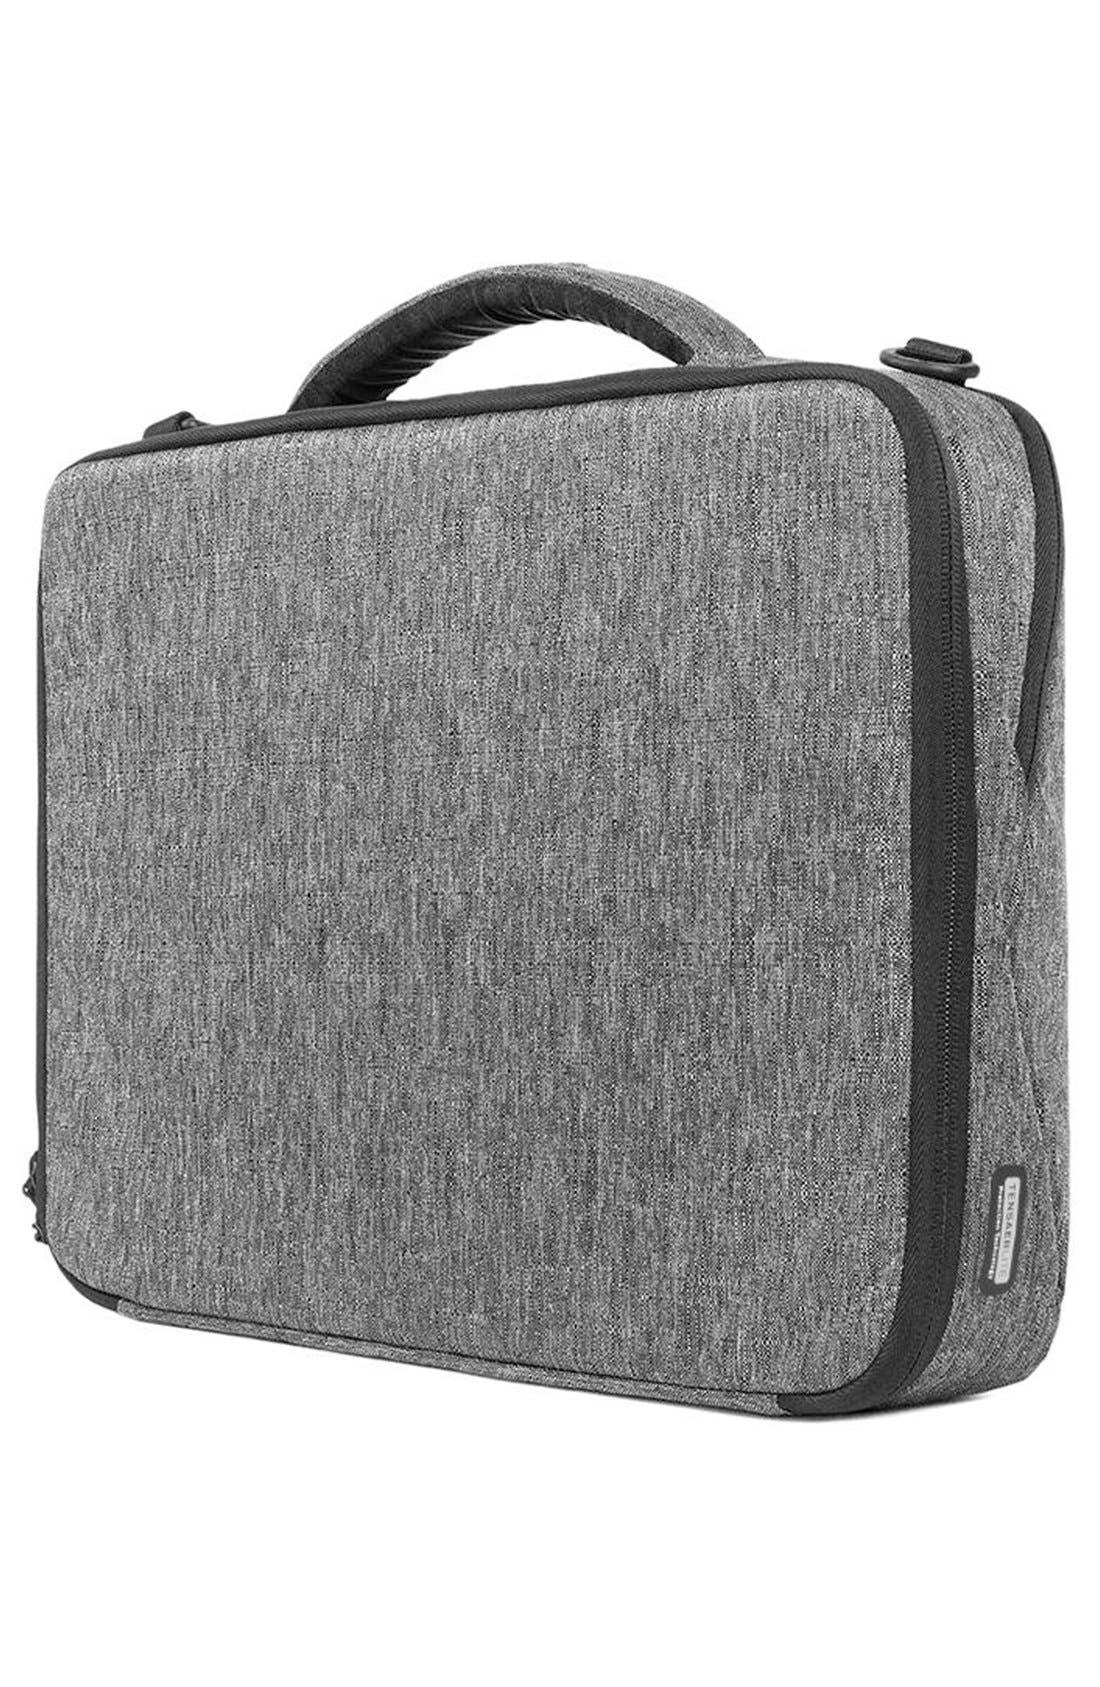 "Alternate Image 6  - Incase Designs 'Reform' 13"" Laptop Briefcase"